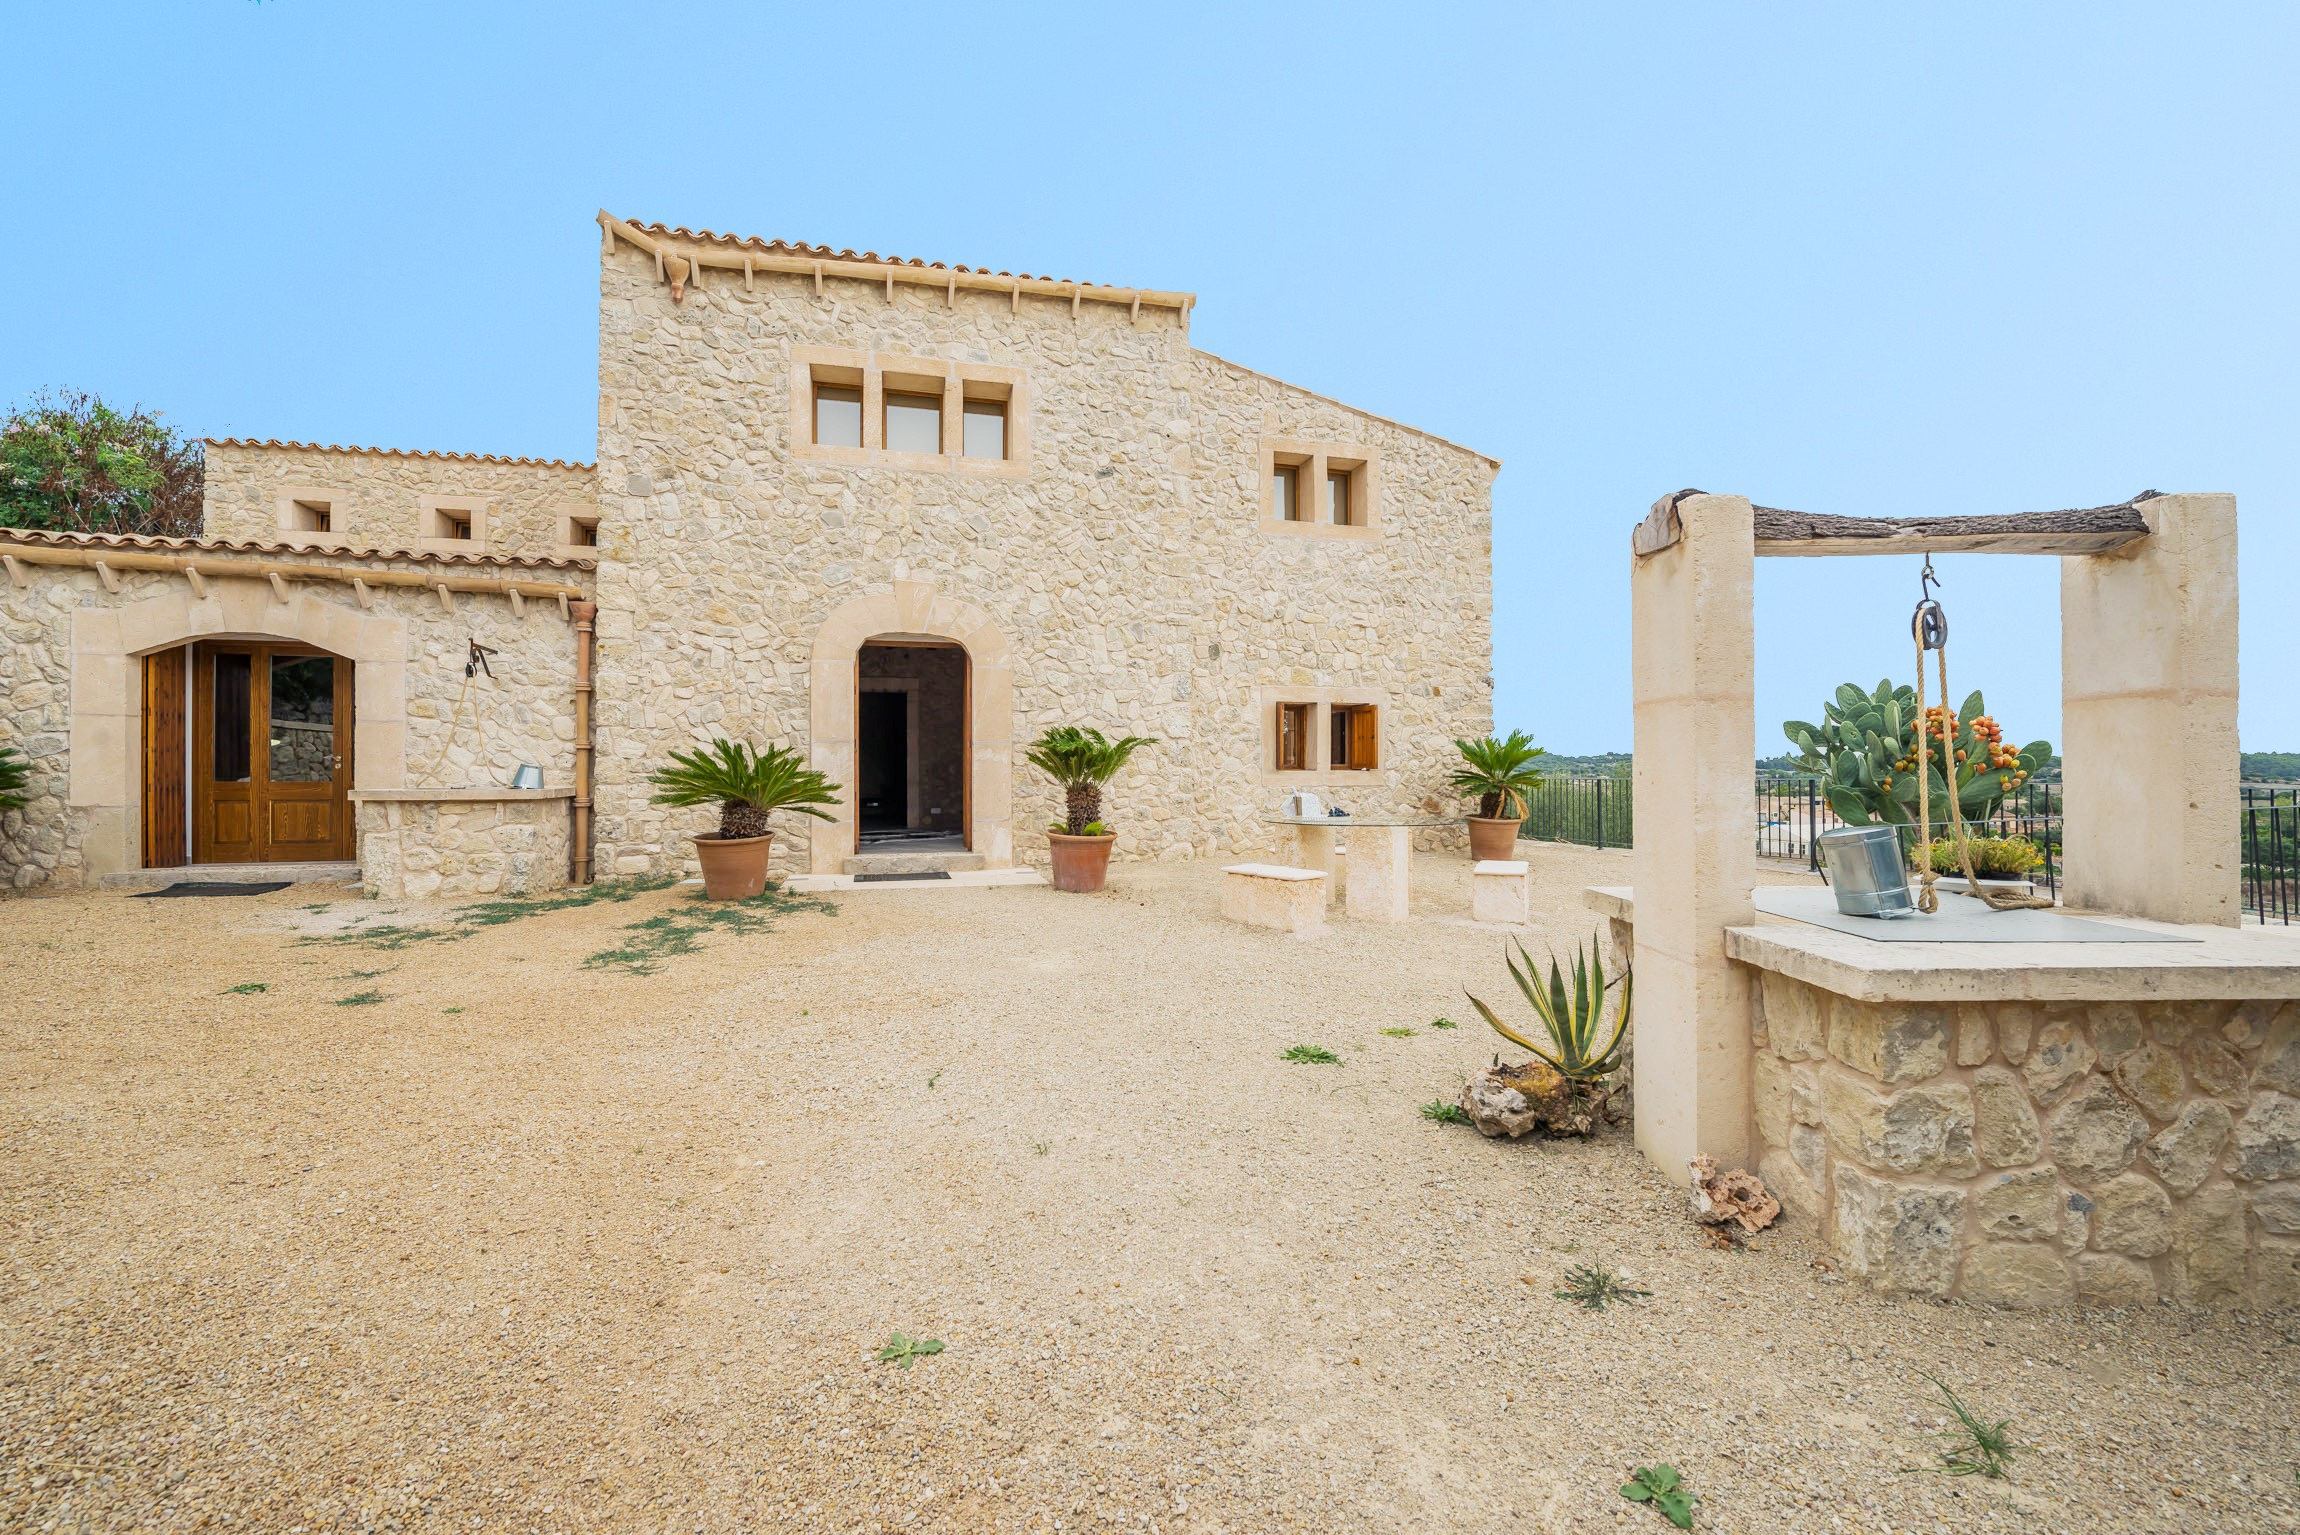 Ferienhaus SON DAVIU (1859500), Petra (ES), Mallorca, Balearische Inseln, Spanien, Bild 6